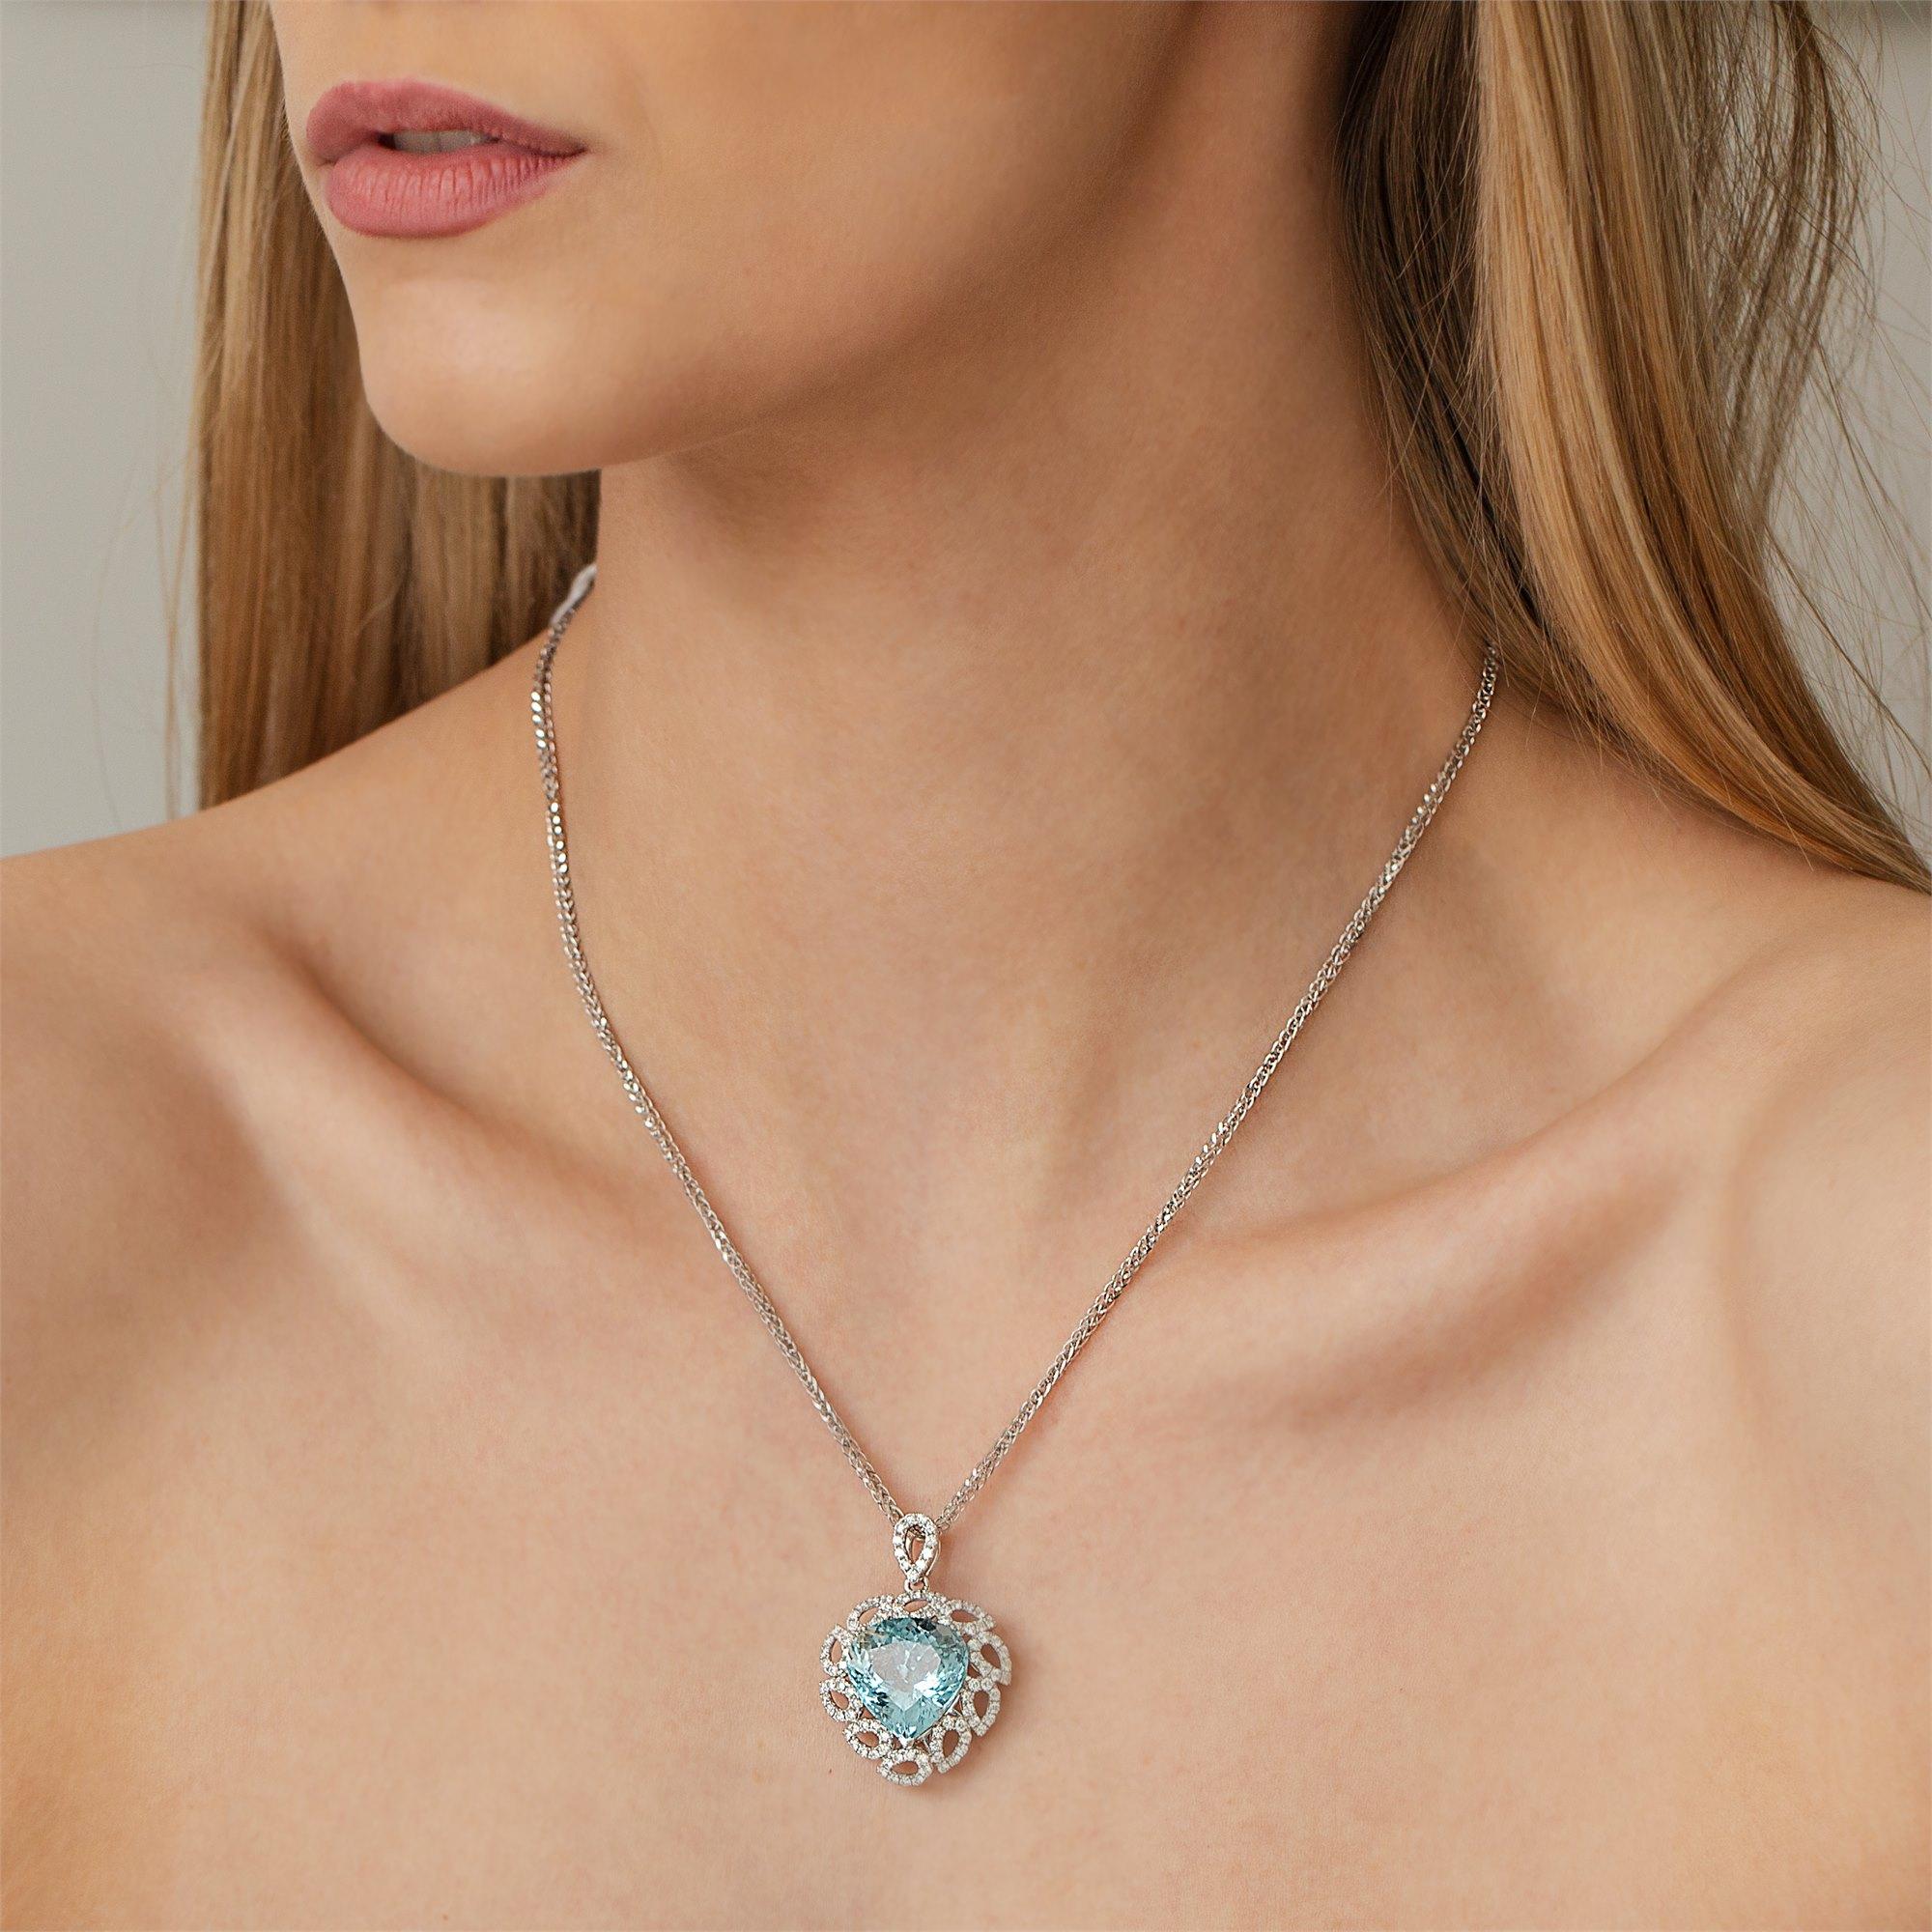 David Jerome 18k White Gold Aquamarine and Diamond Pendant